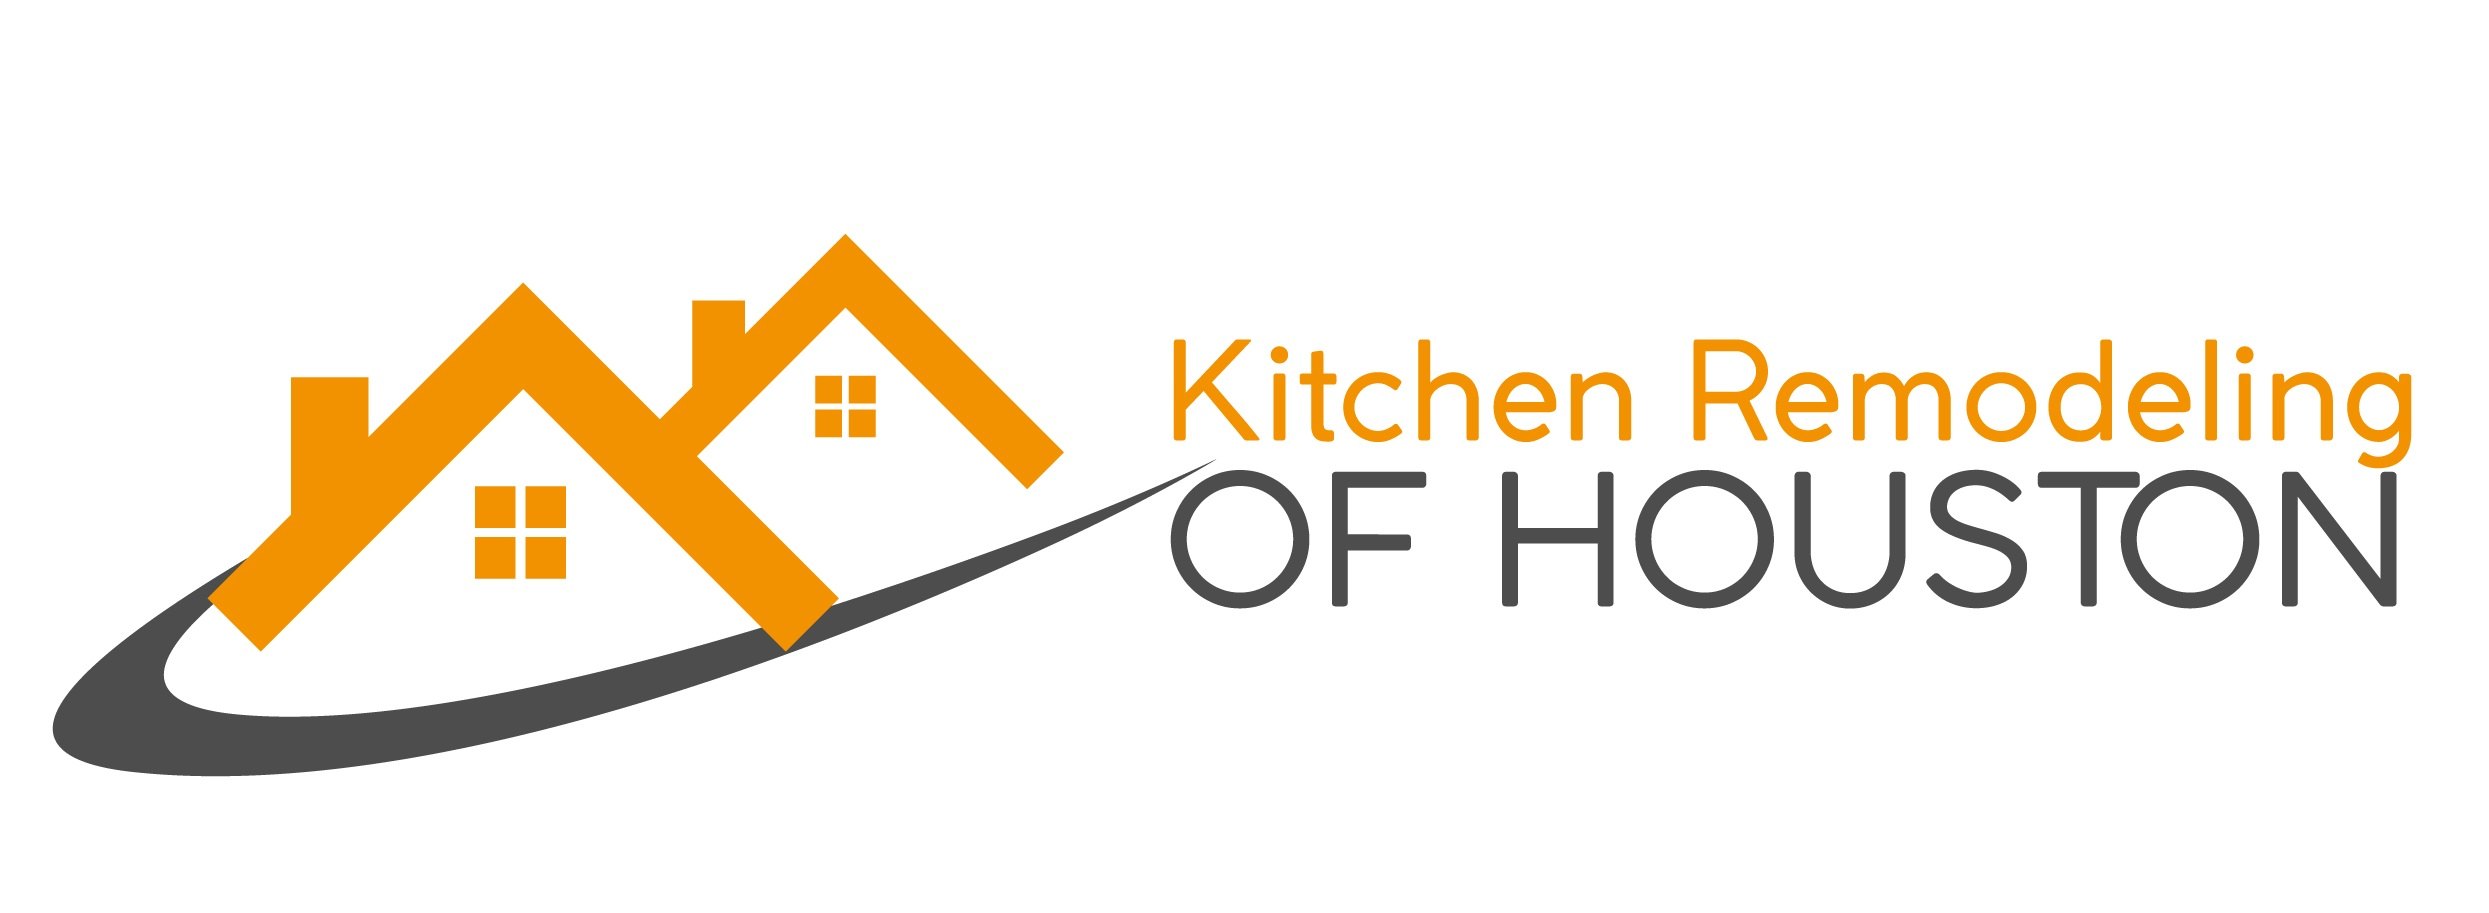 Houston Kitchen Remodeling Company Testimonials